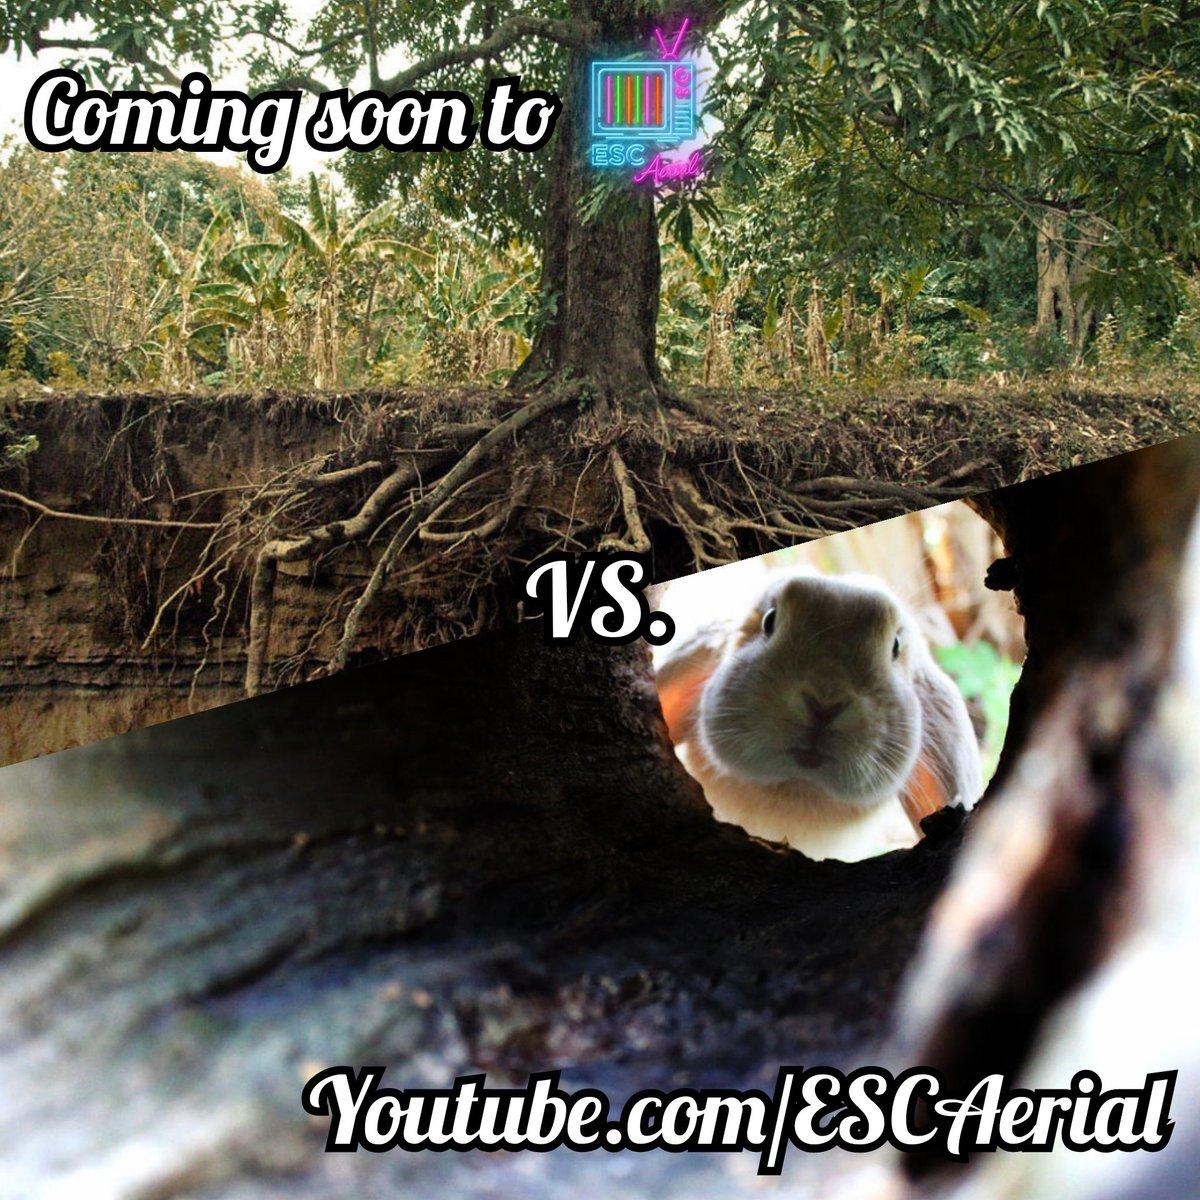 Sprouting soon at #ESCAerial. Youtube.com/ESCAerial #ESC2020